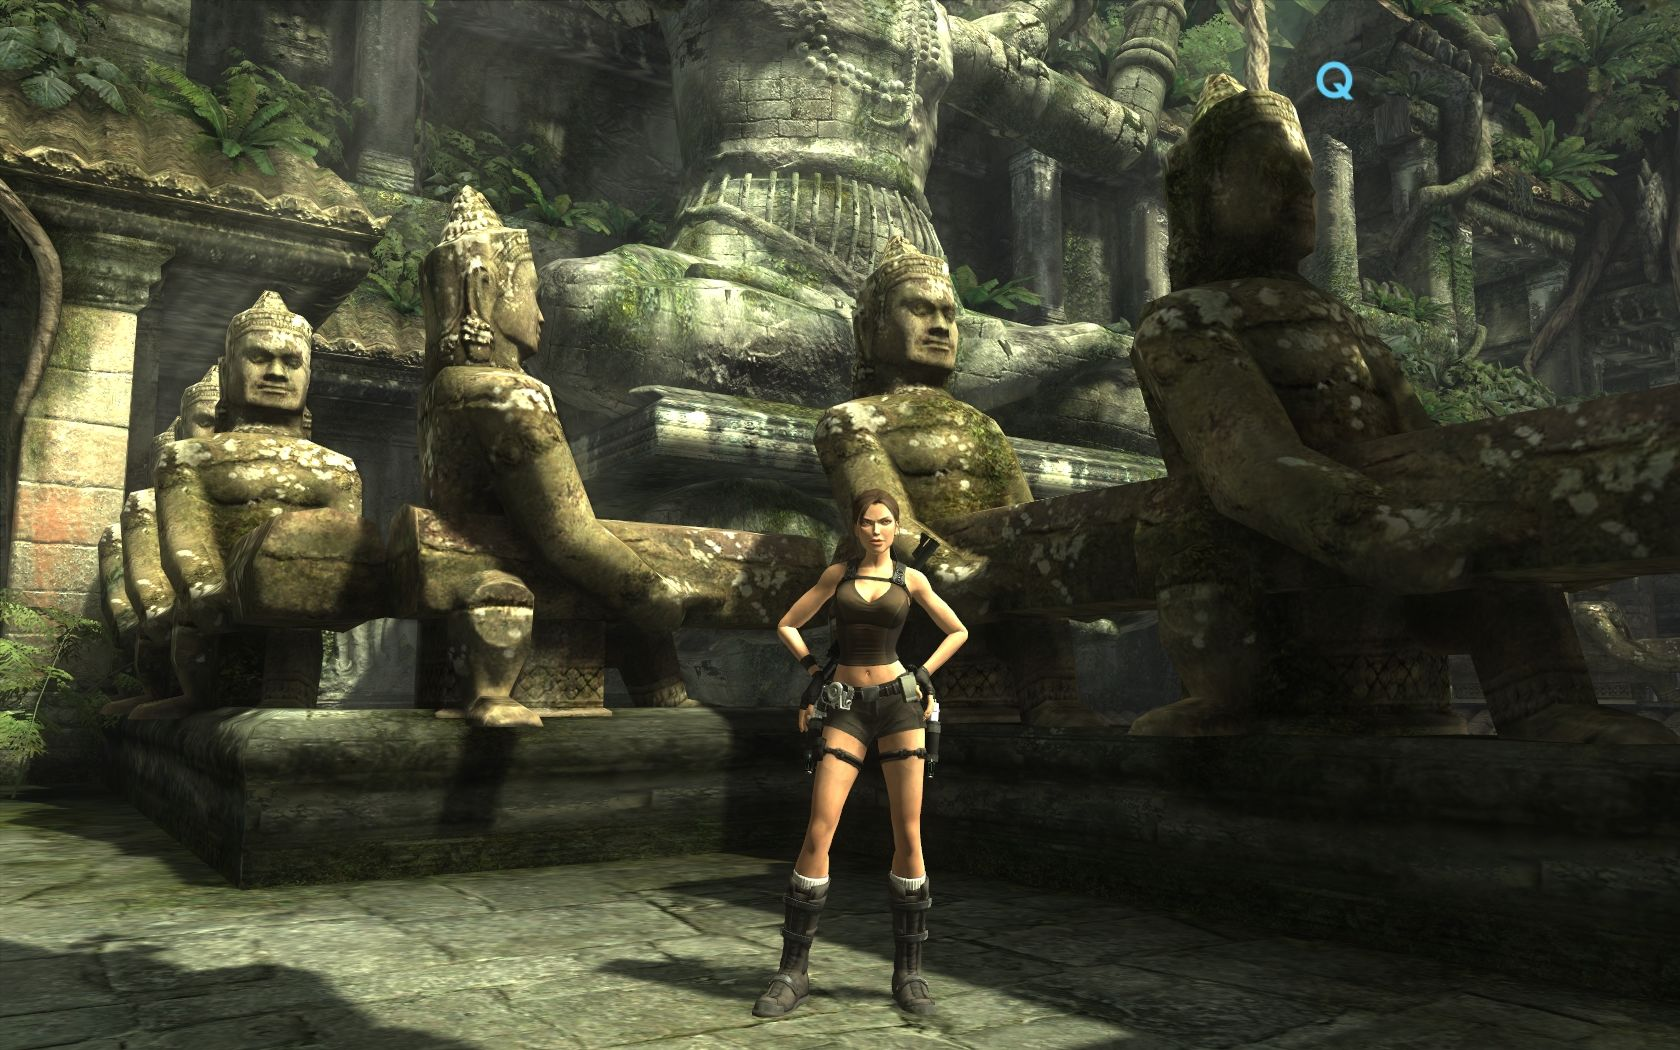 графика в игре Tomb Raider: Underworld